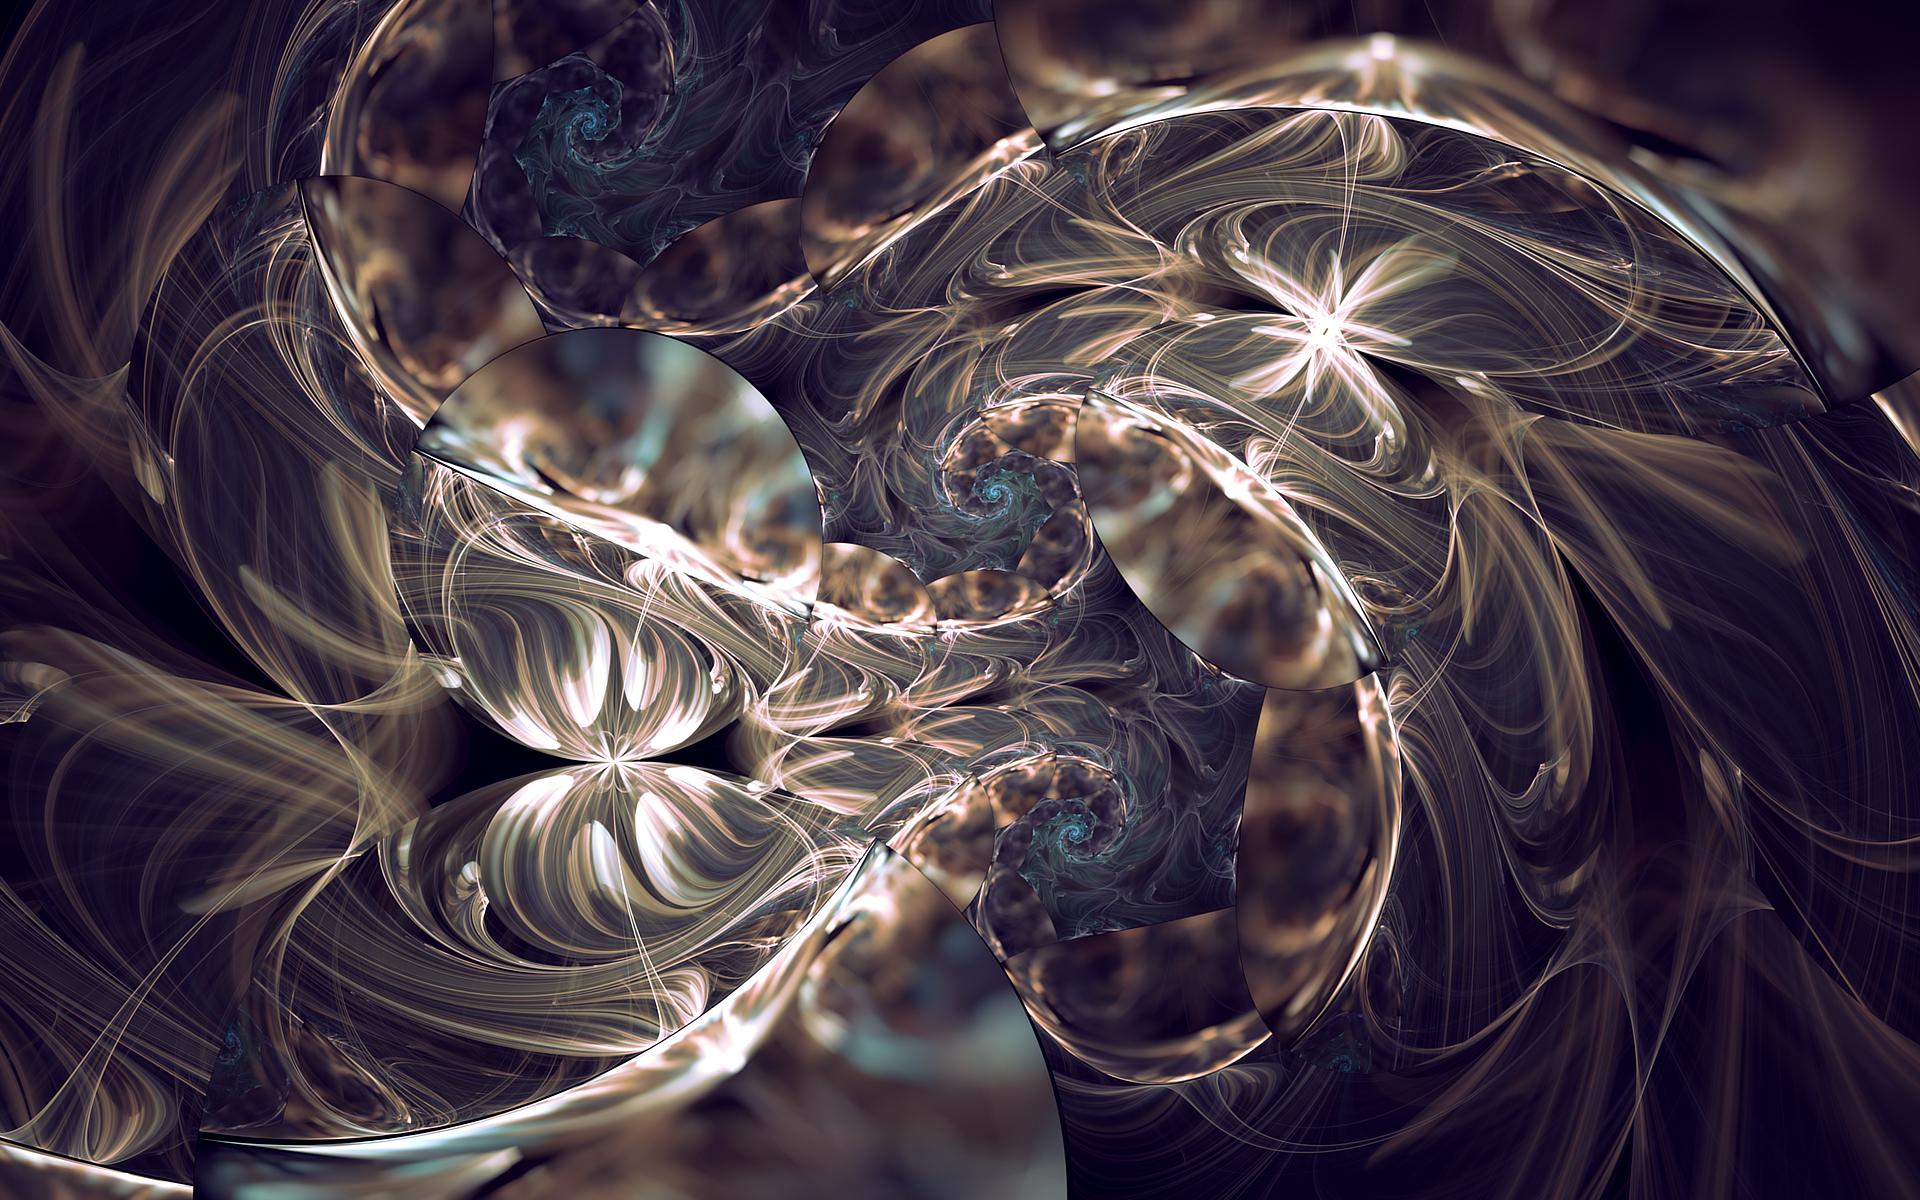 White Spider by tatasz